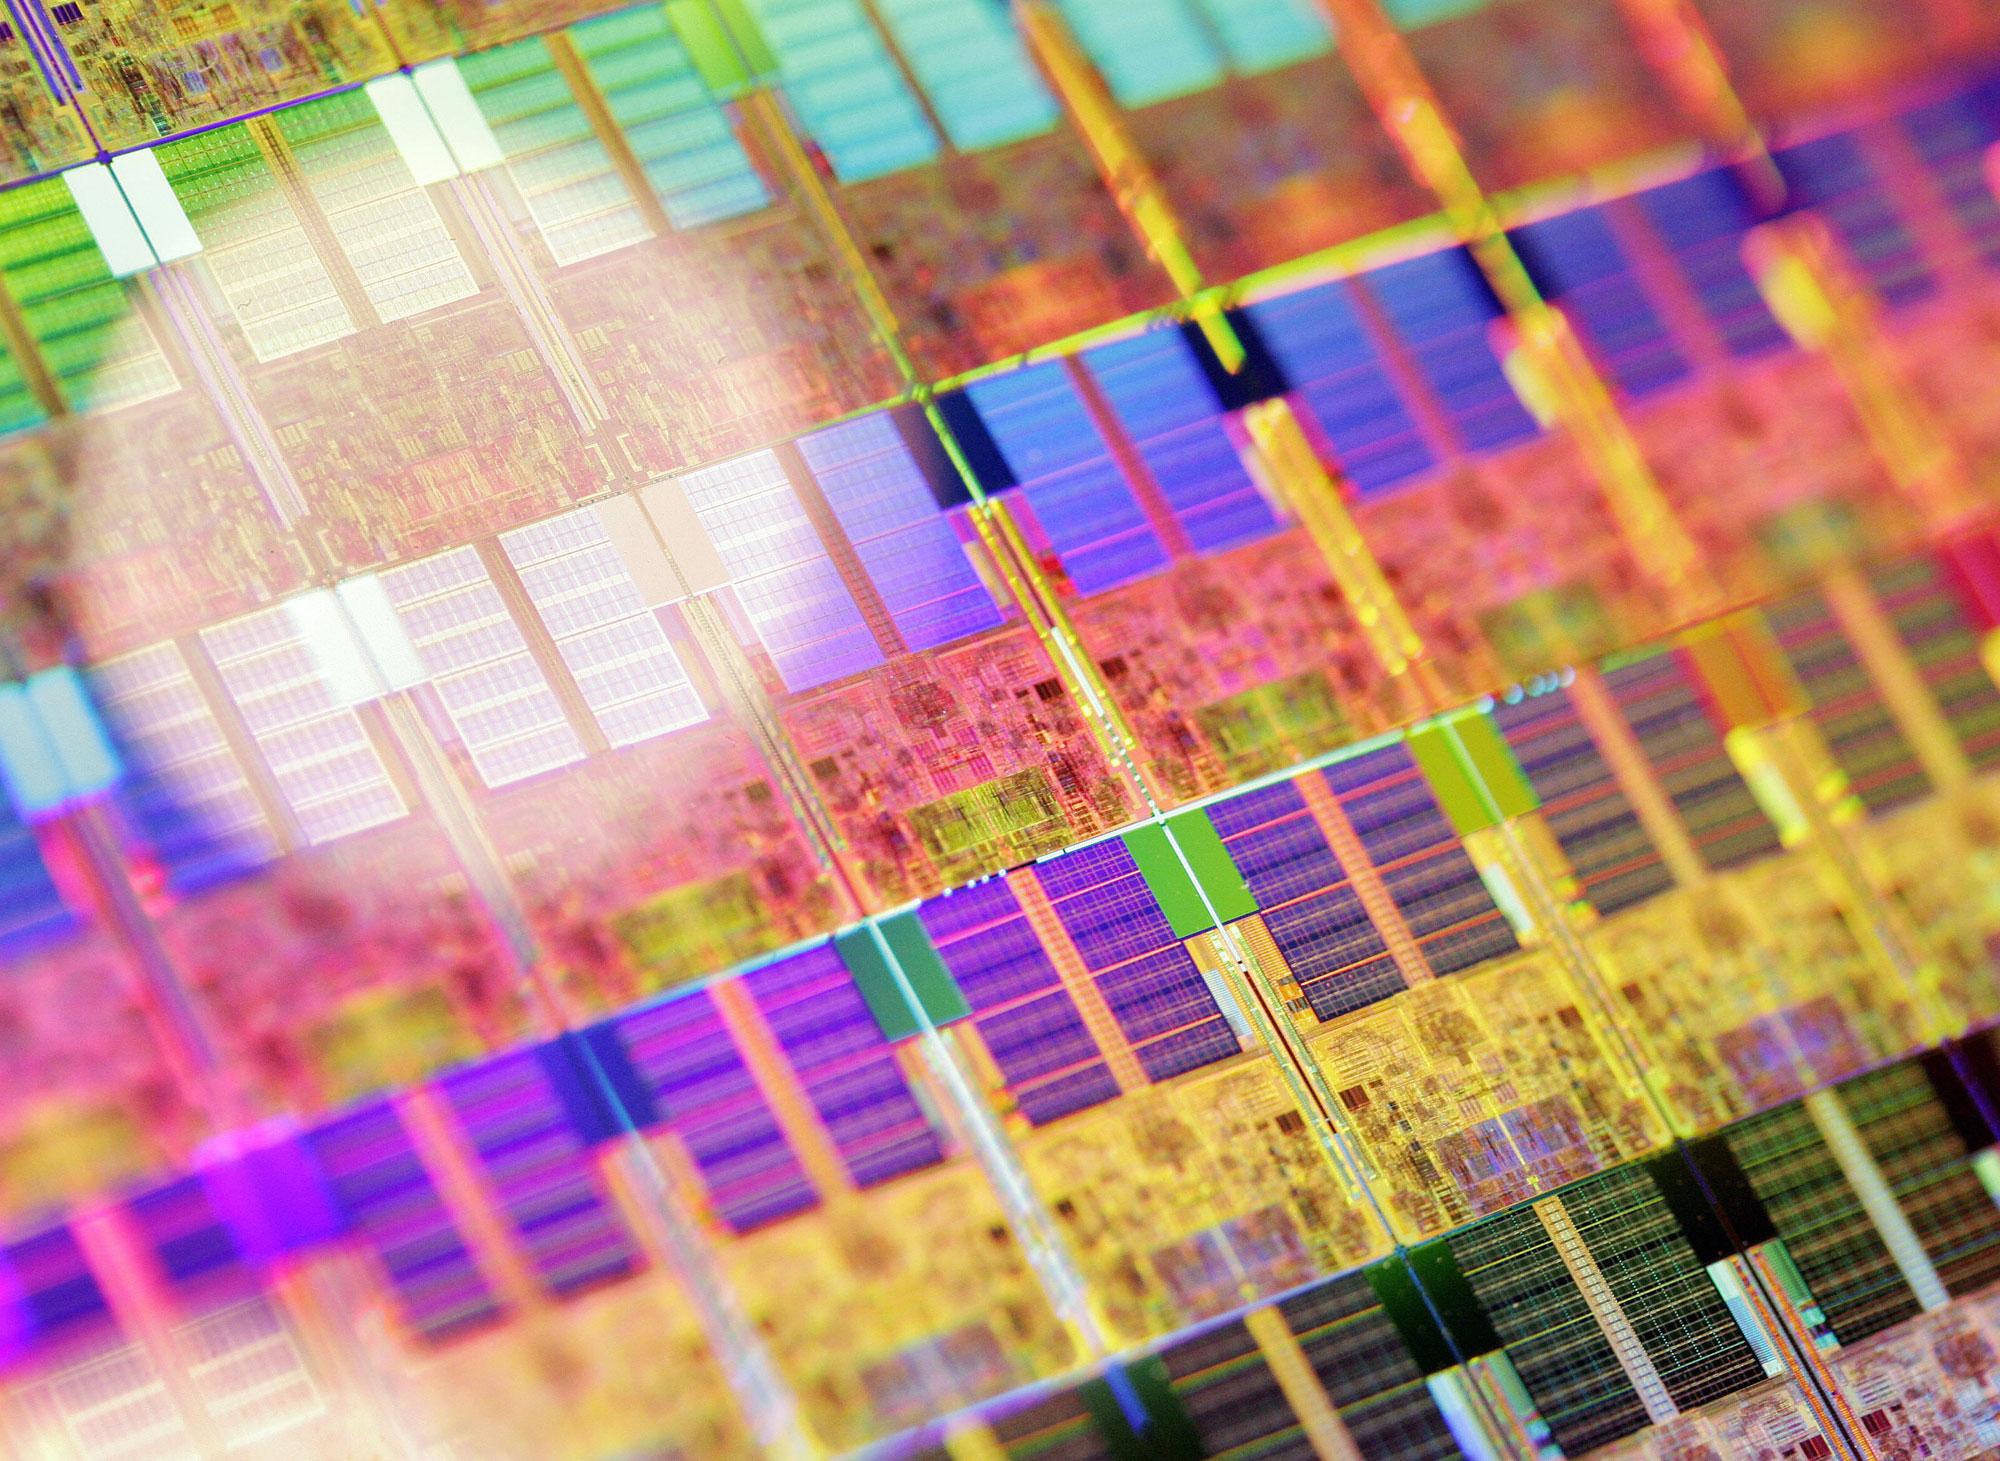 A 45nm process 300mm silicon wafer is di